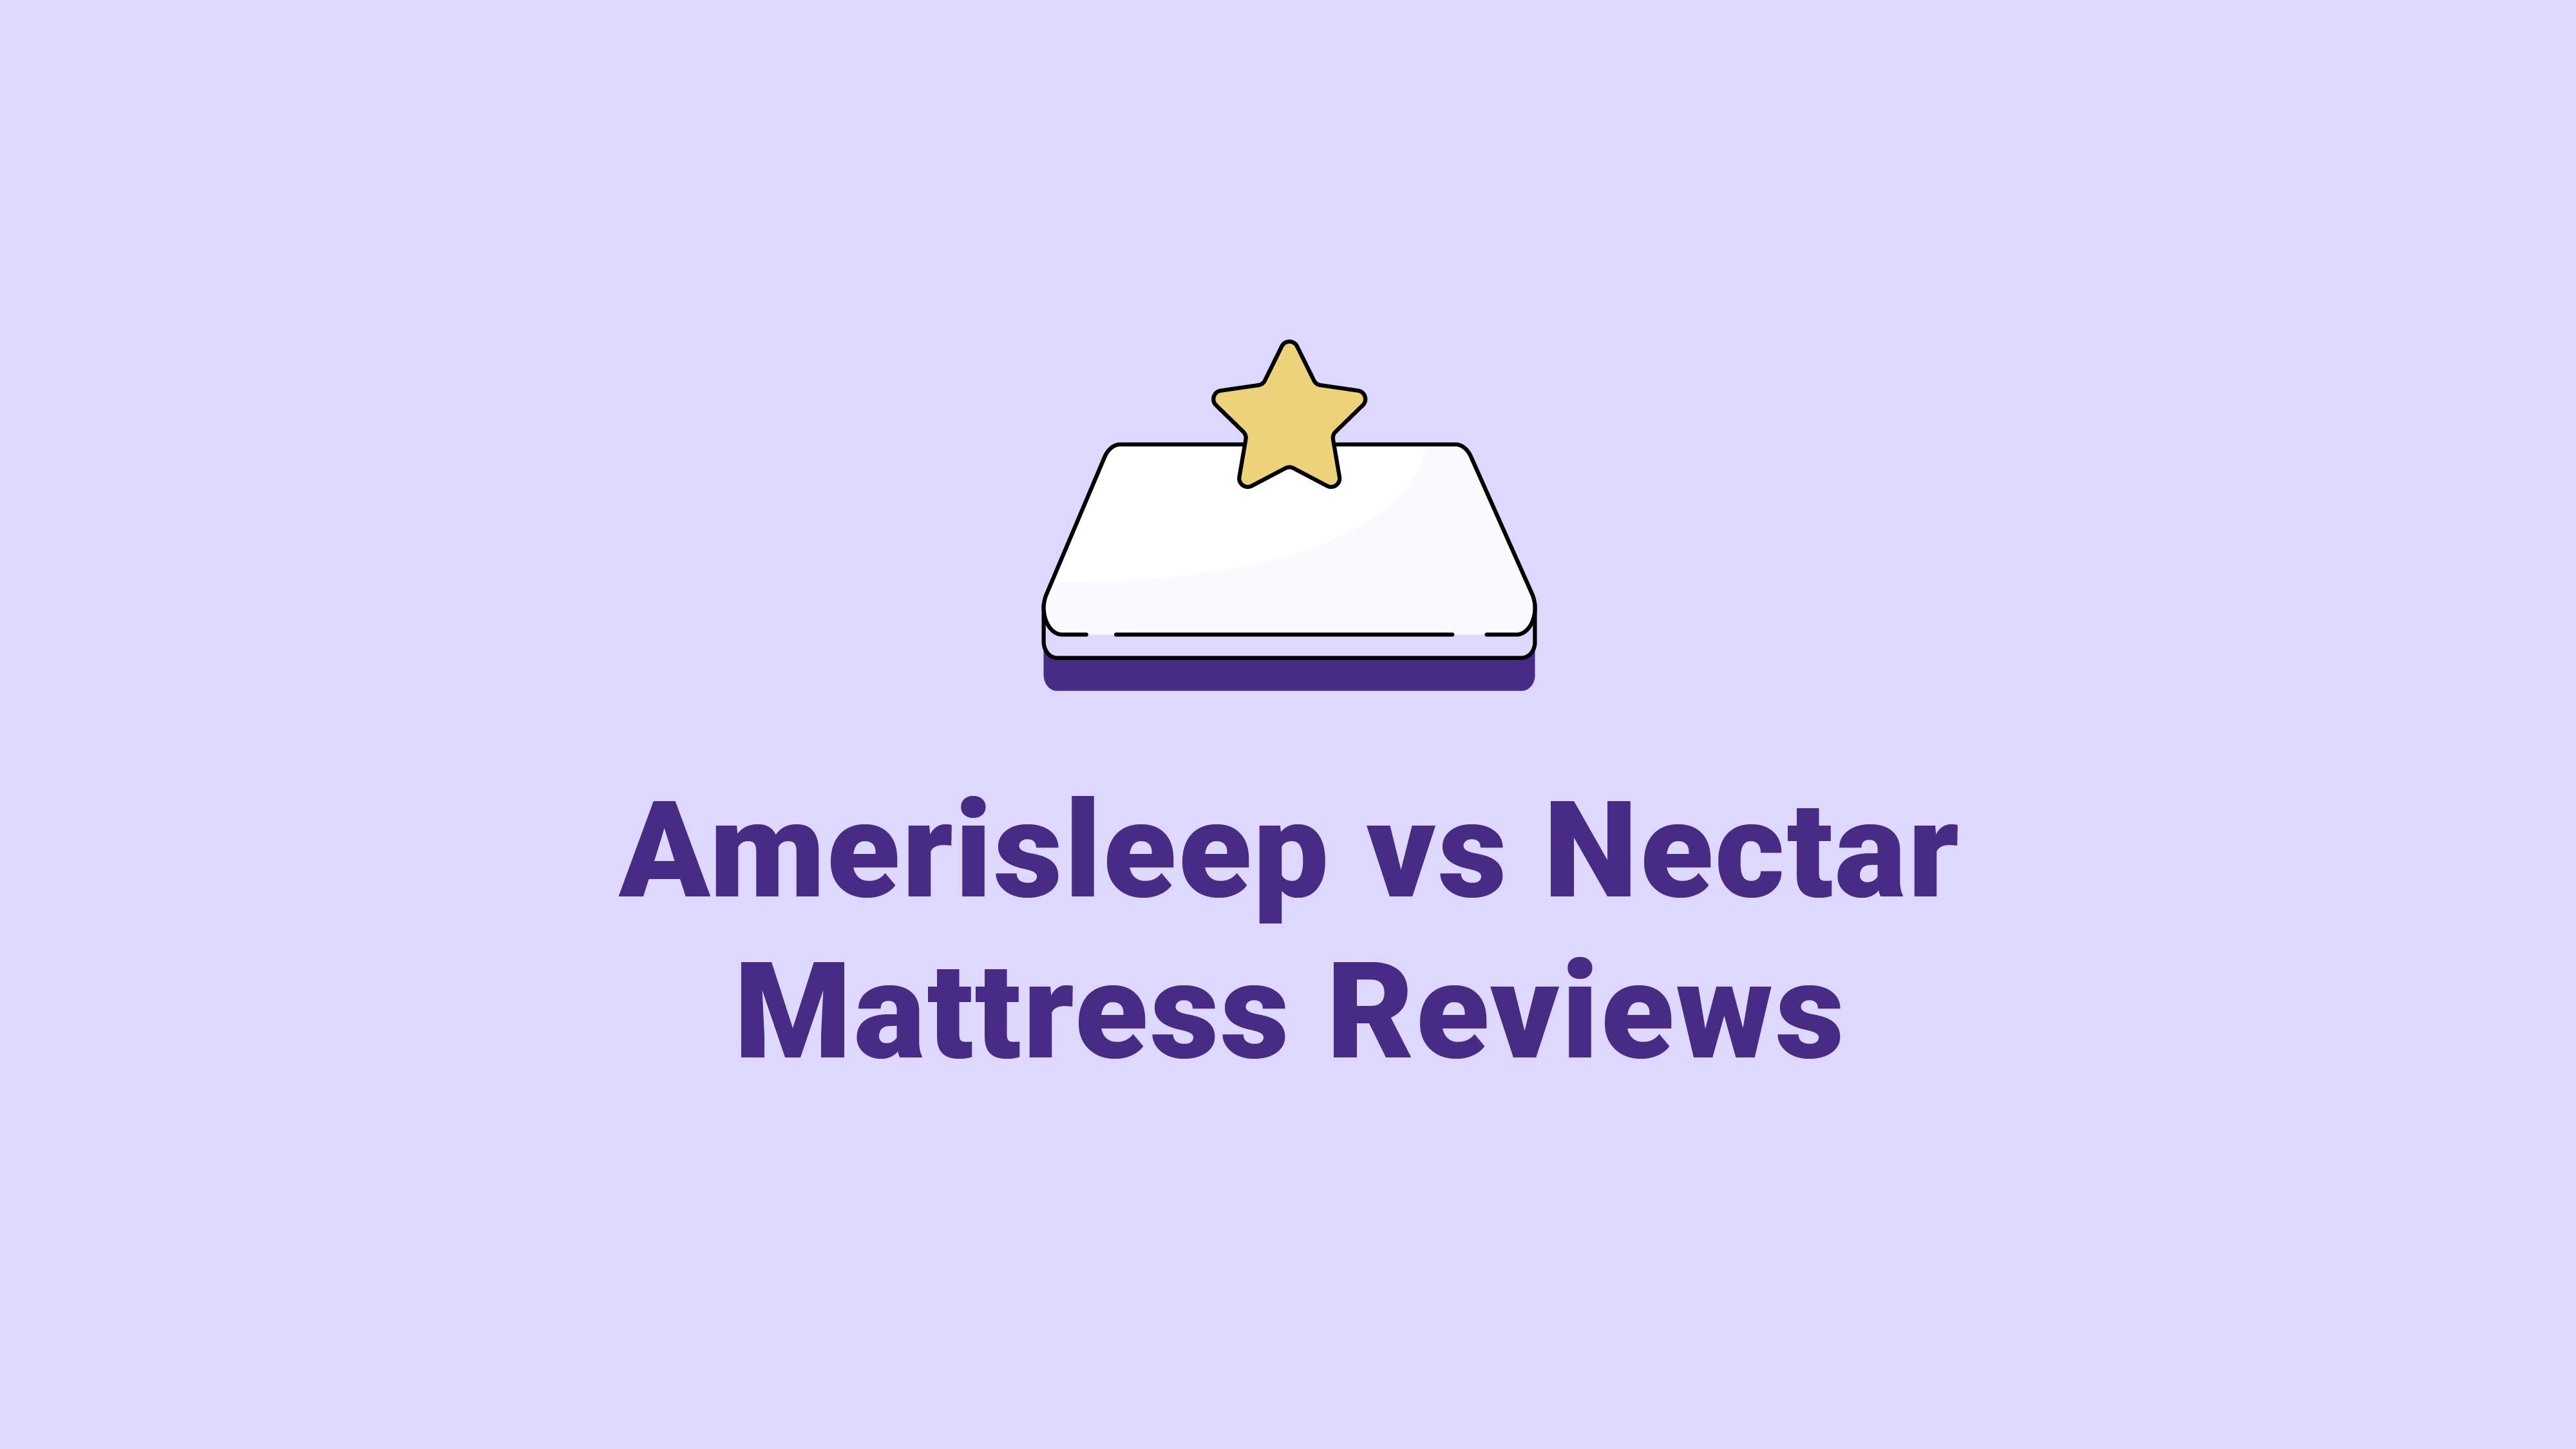 Amerisleep vs. Nectar Mattress Reviews